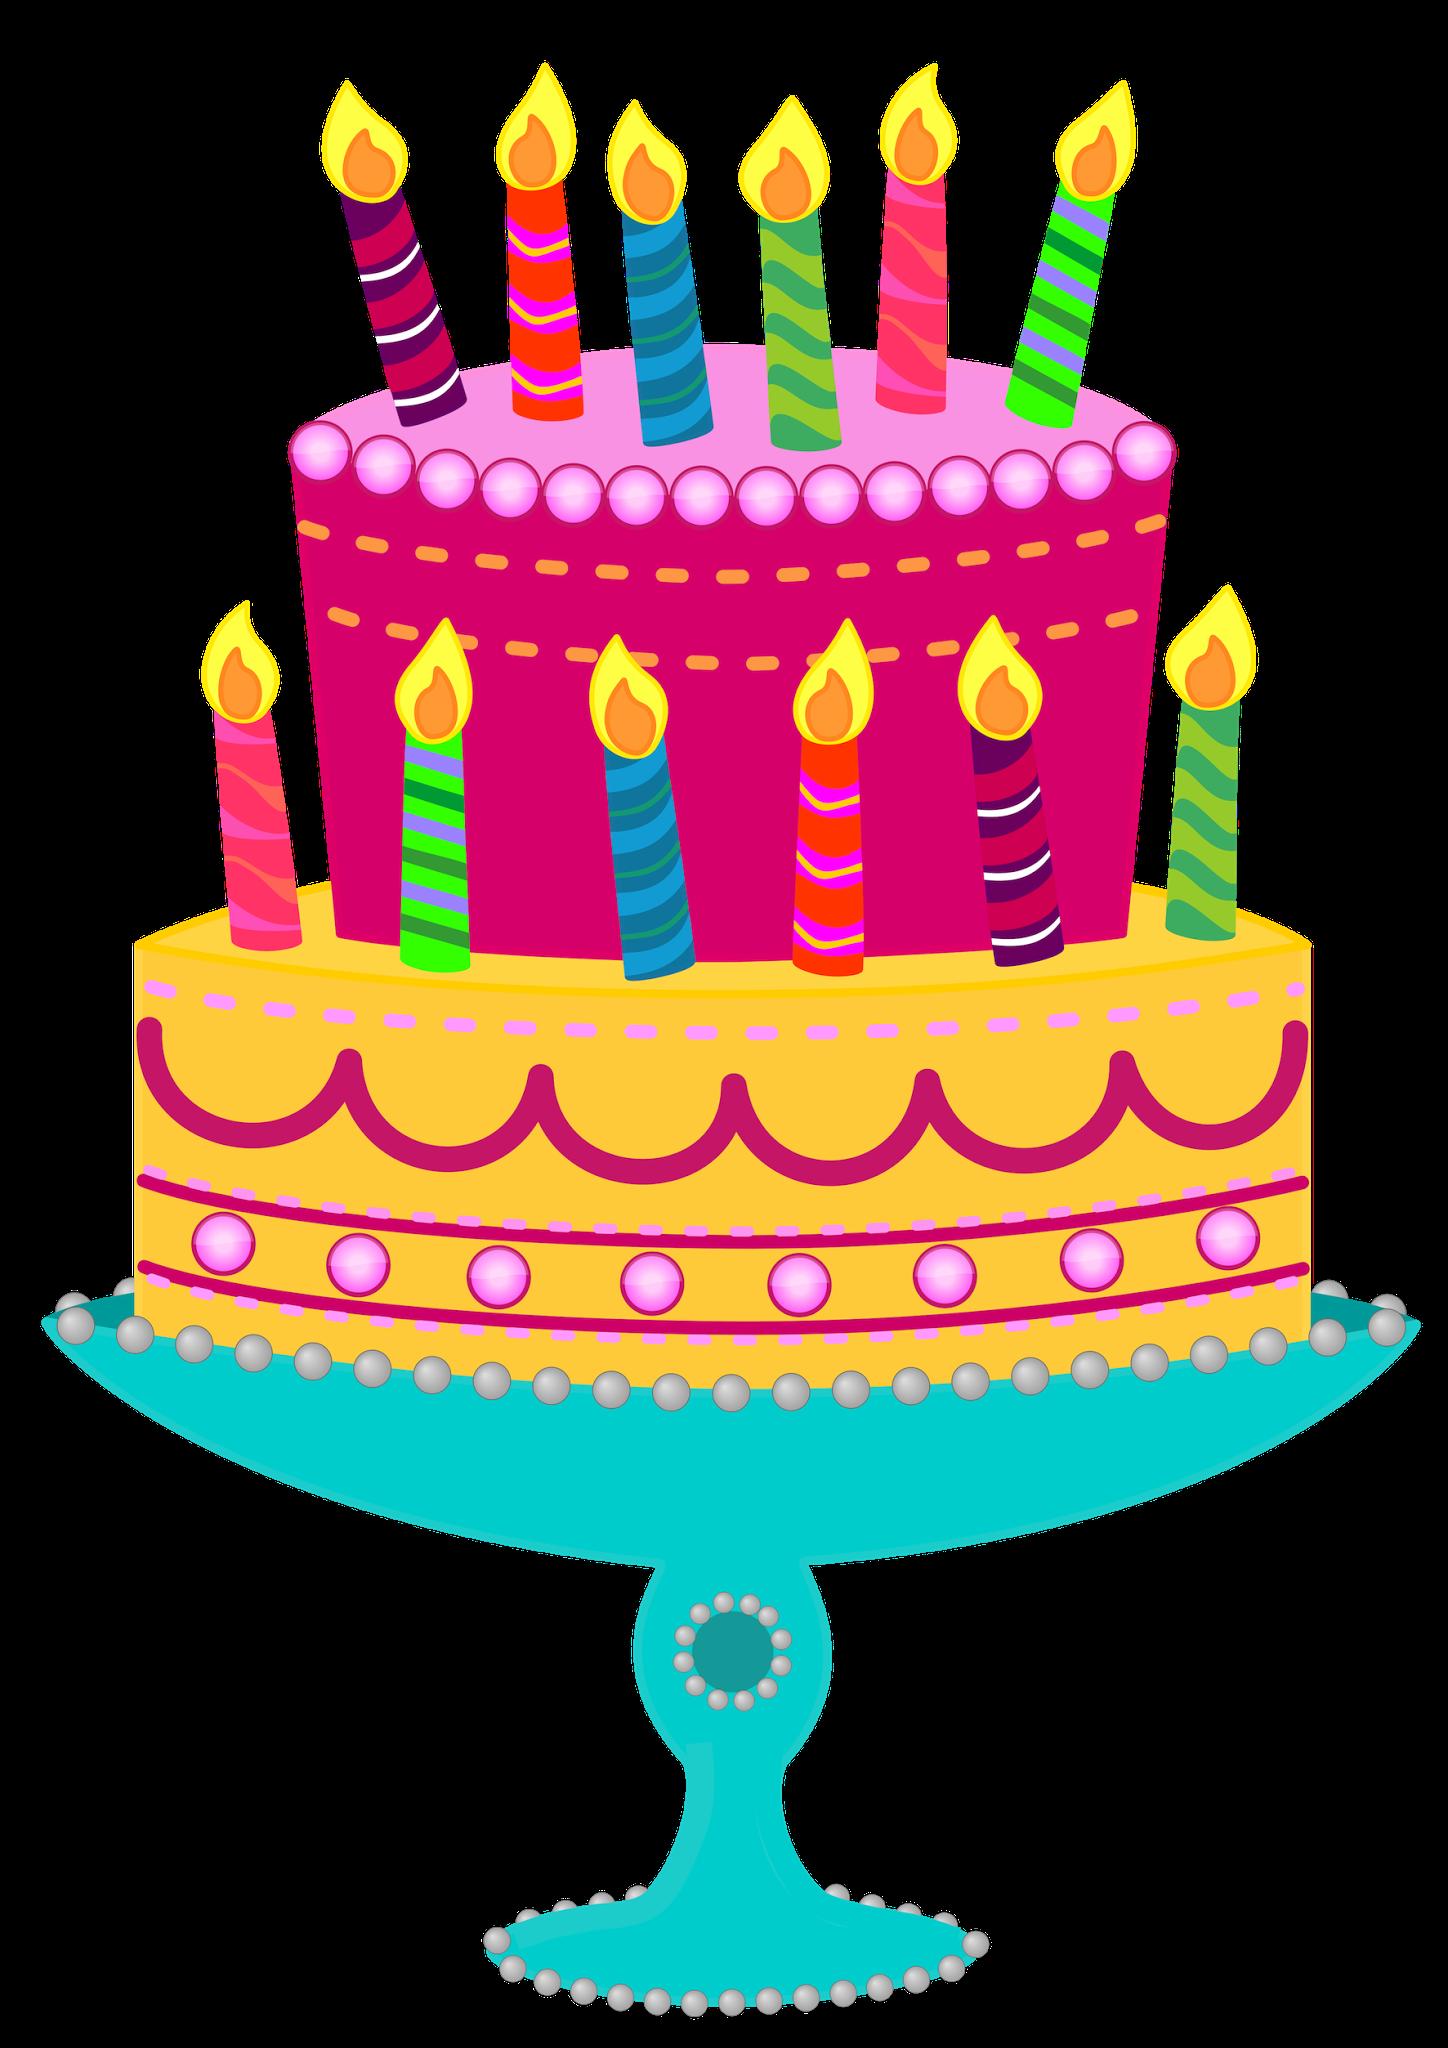 Birthday cake clipart 4